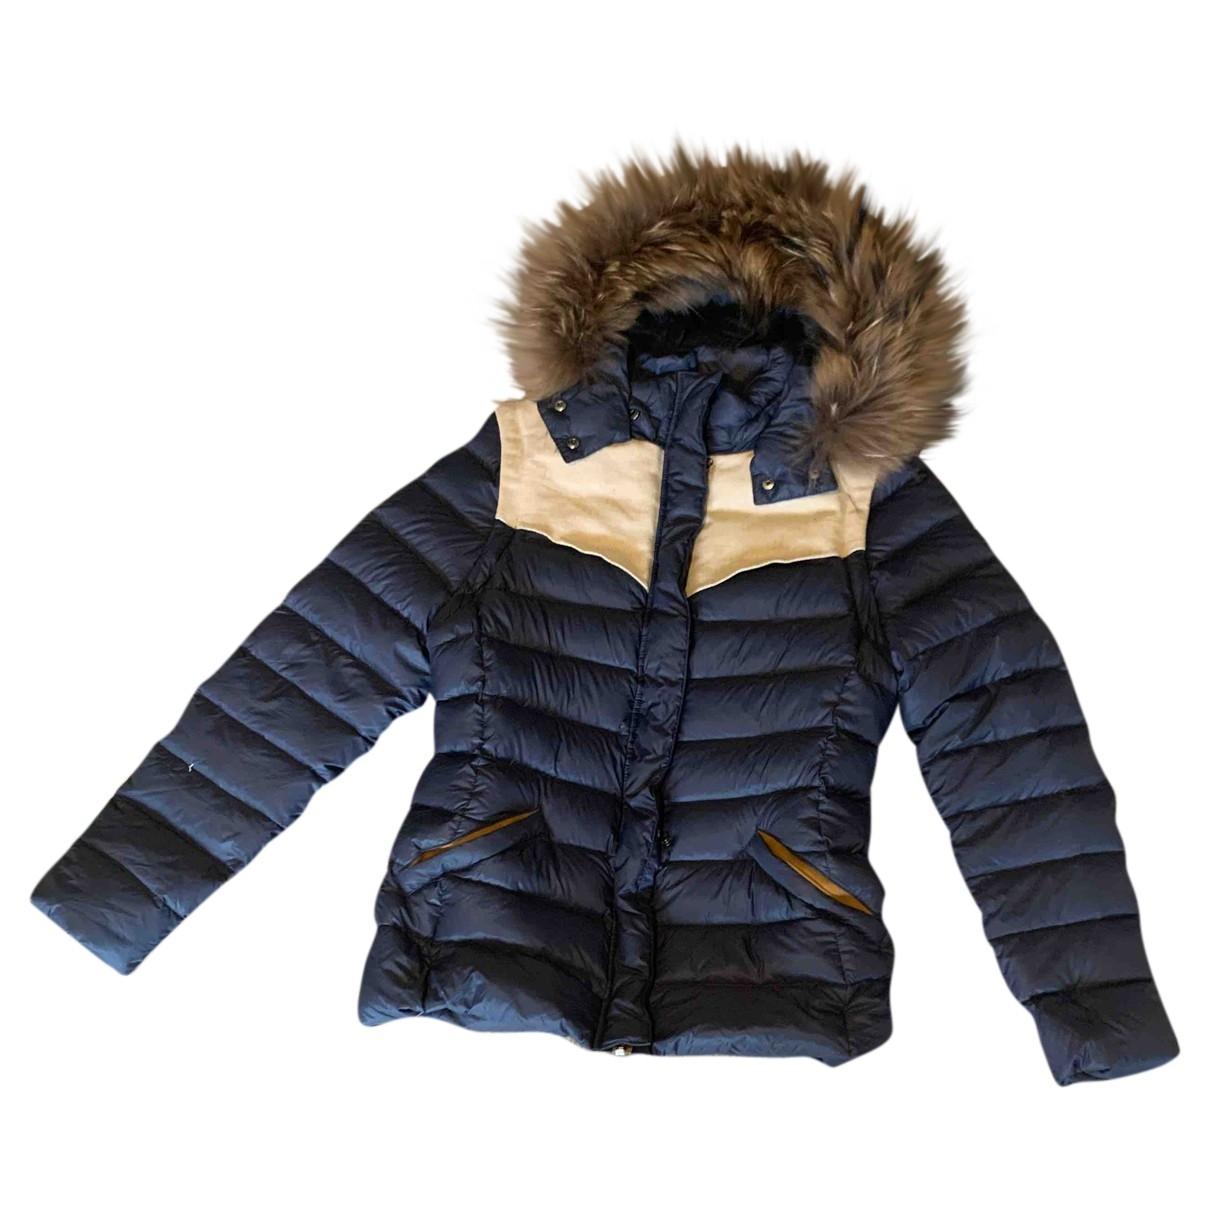 Gertrude+gaston \N Blue coat for Women 38 FR